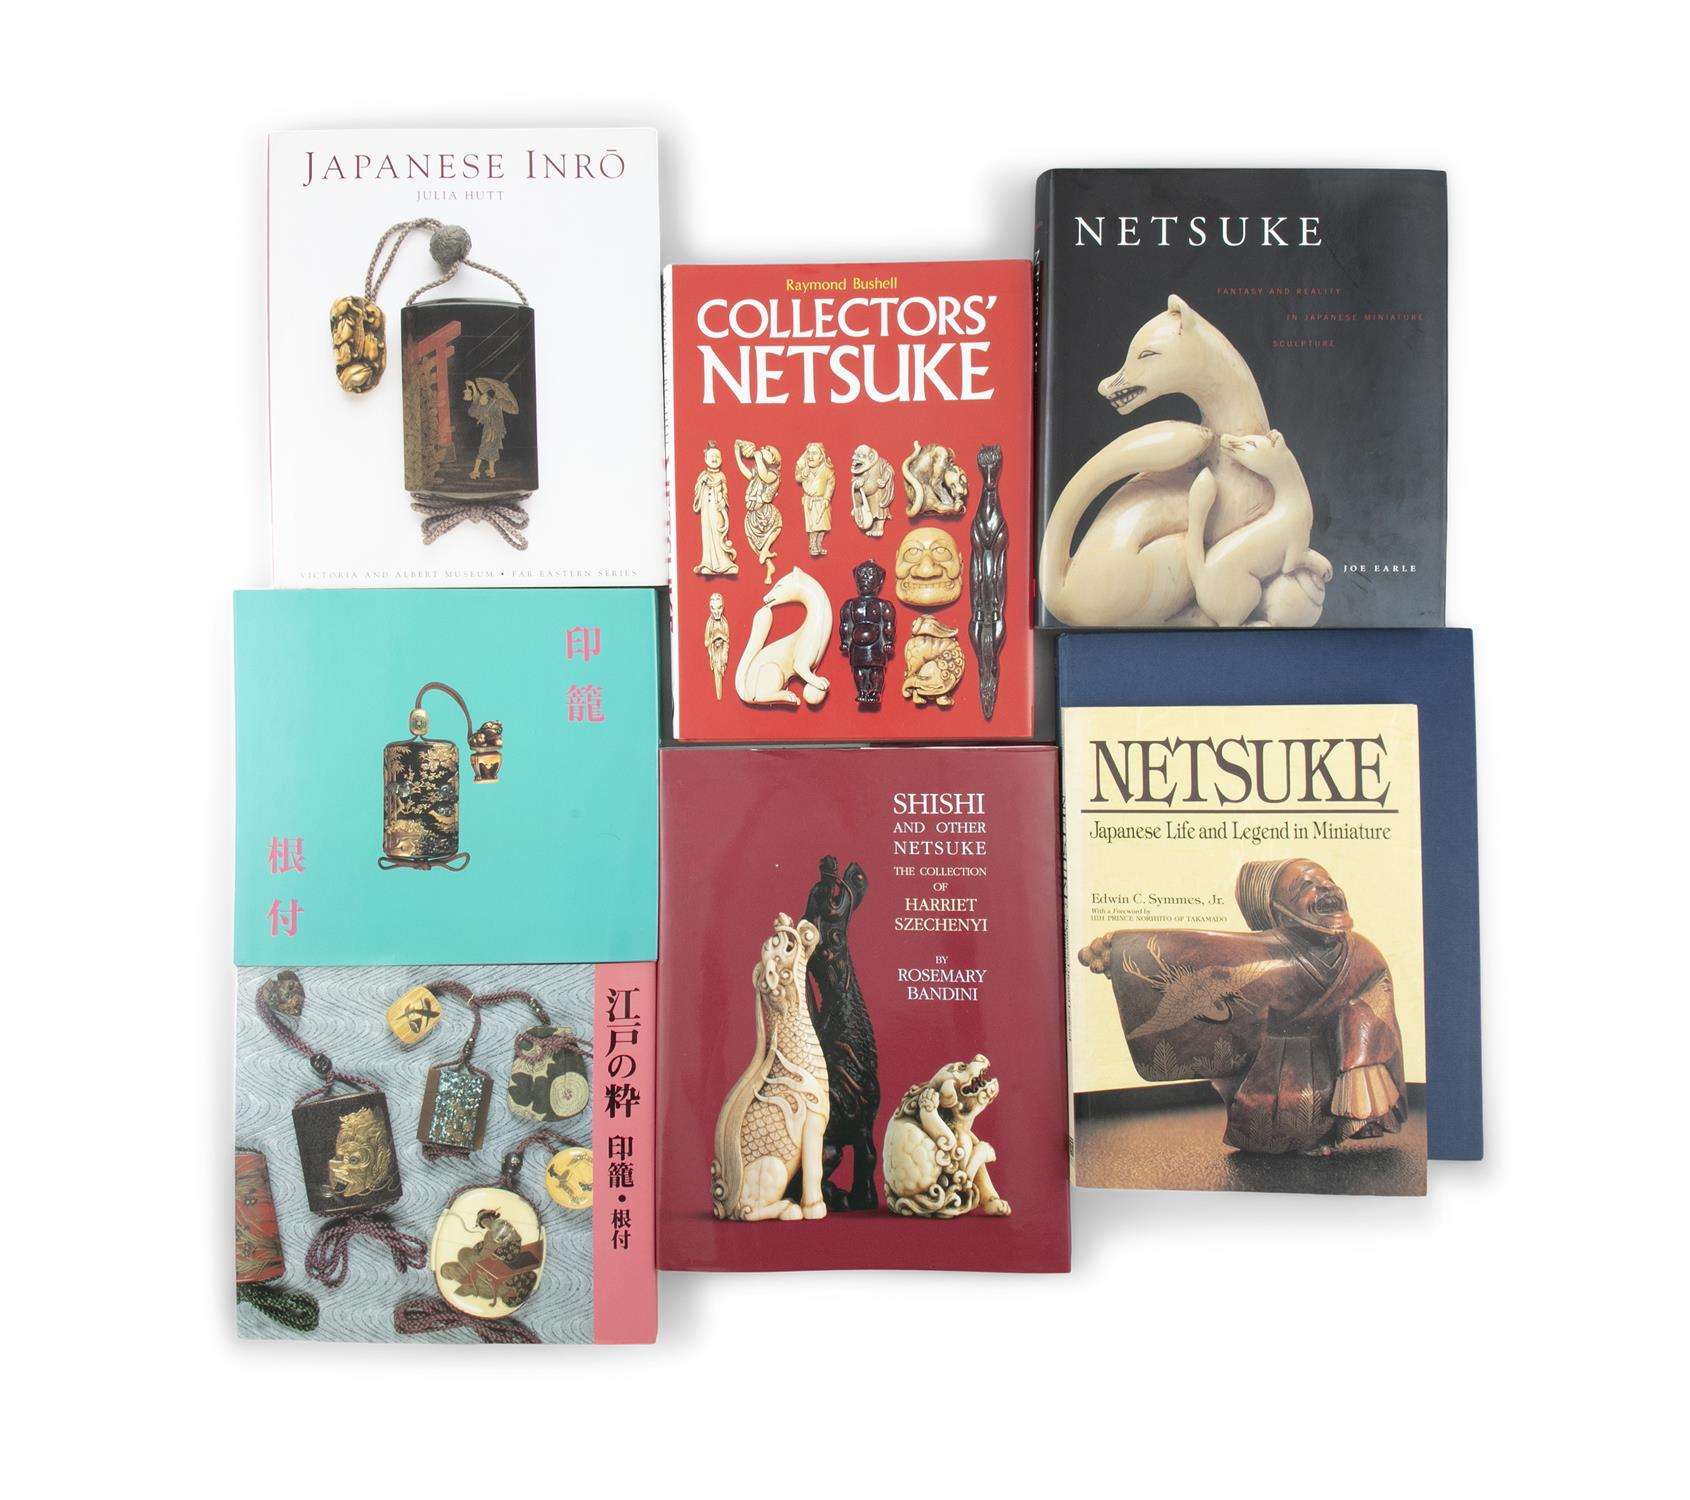 A DOCUMENTATION / GROUP OF NINE (9) BOOKS ON JAPANESE INRO AND NETSUKE 20th century, - Image 2 of 2